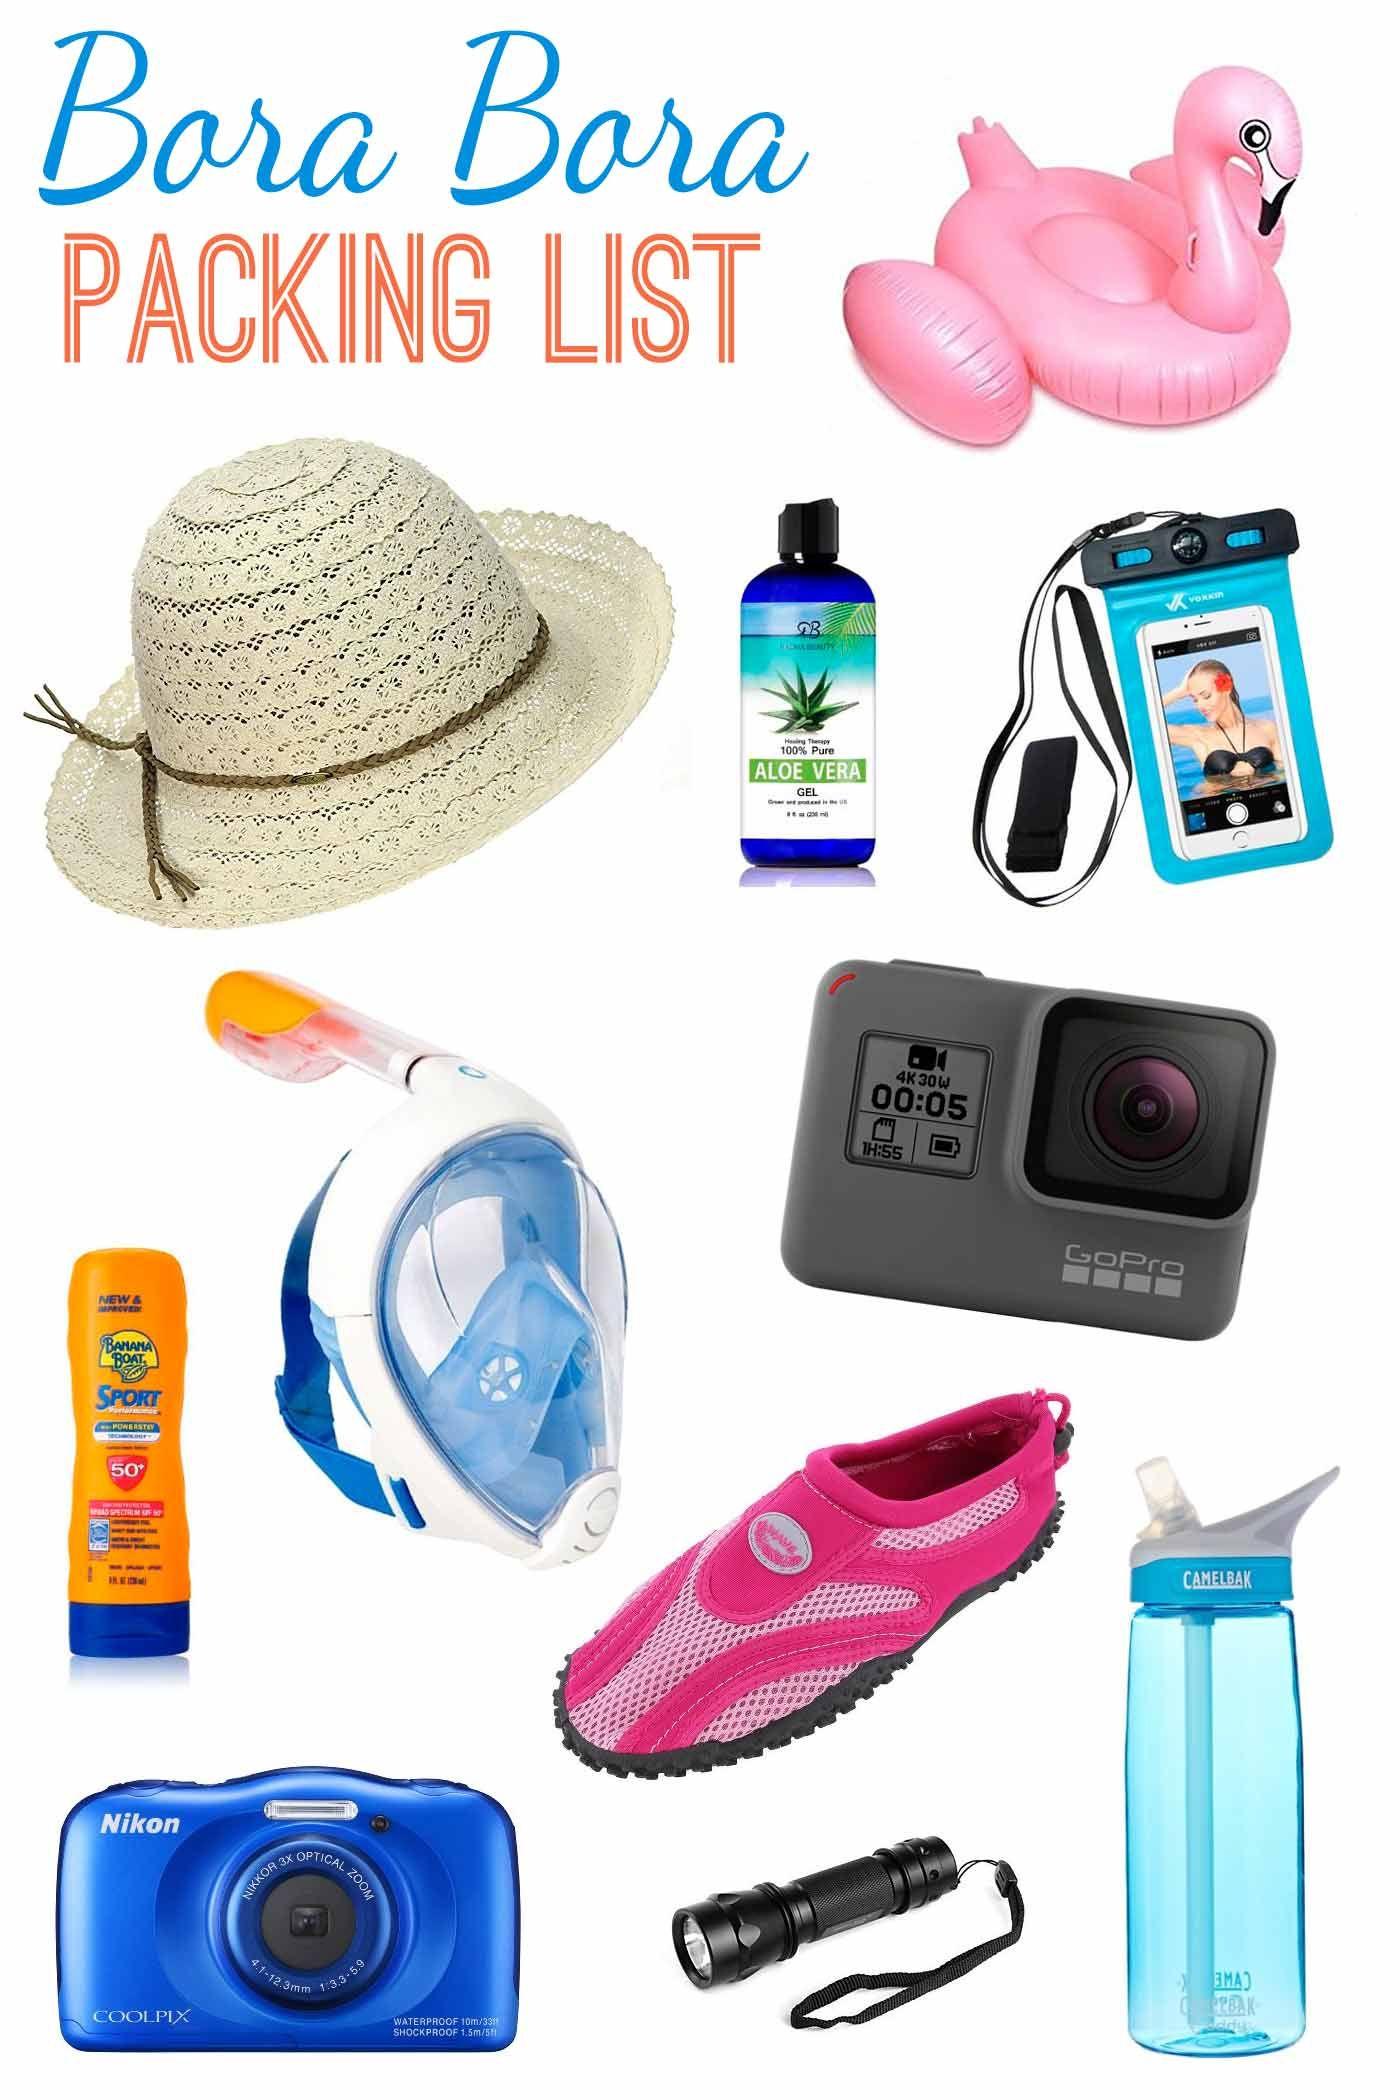 Bora Packing List